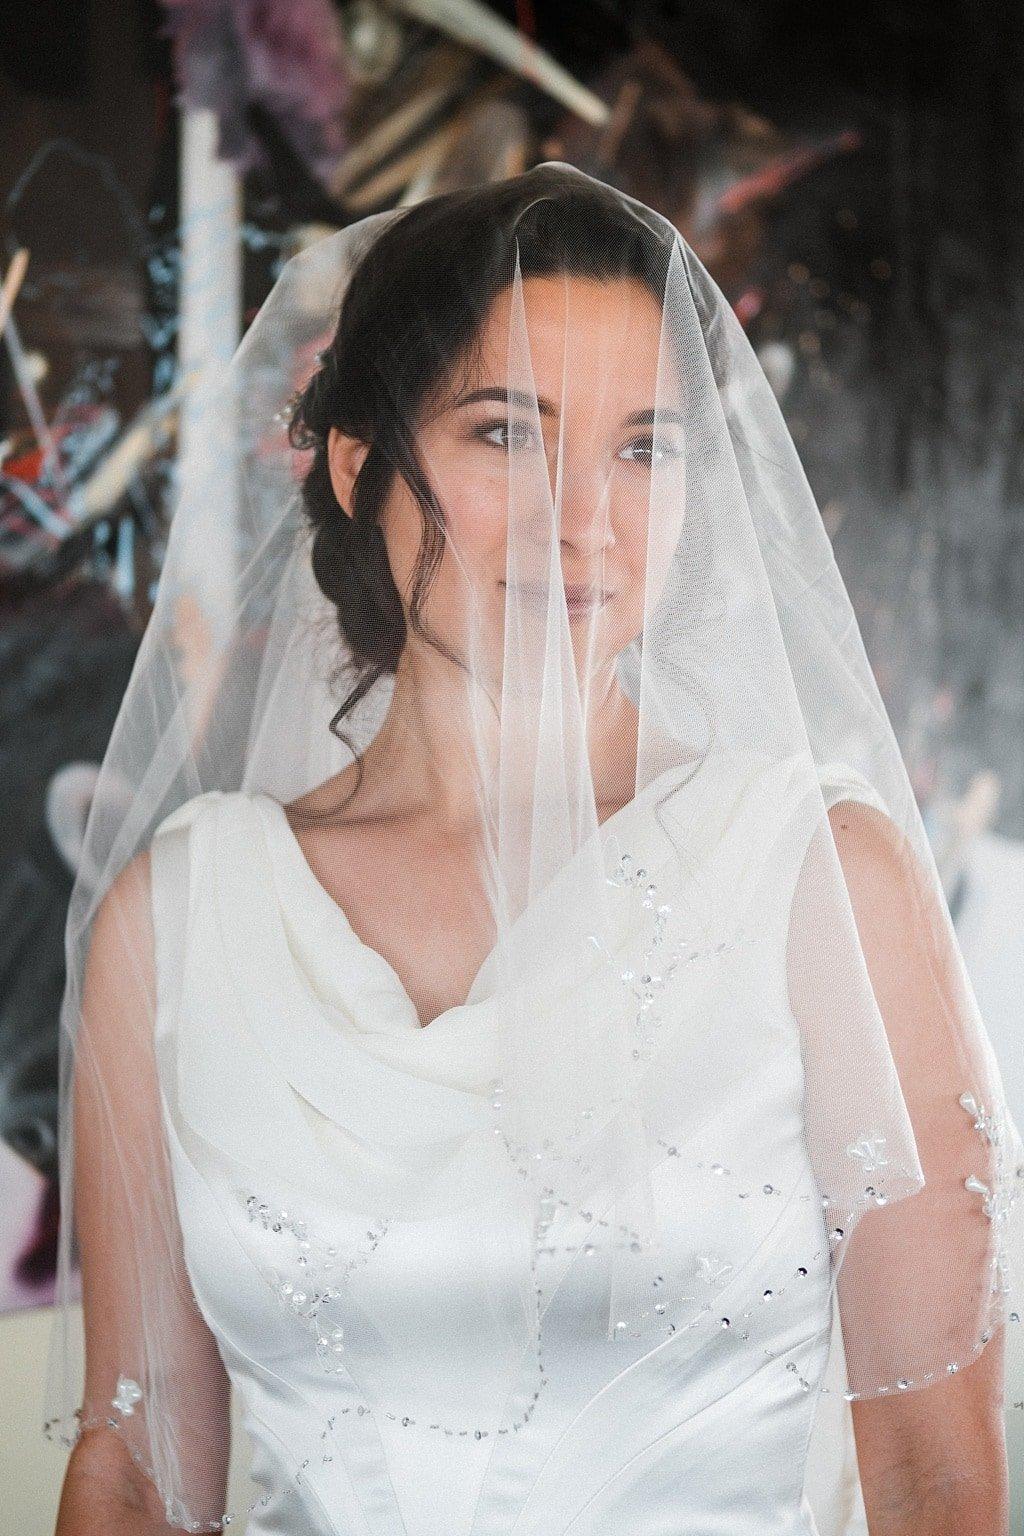 Bride wearing veil getting ready at Flagstaff House wedding venue restaurant Boulder Colorado